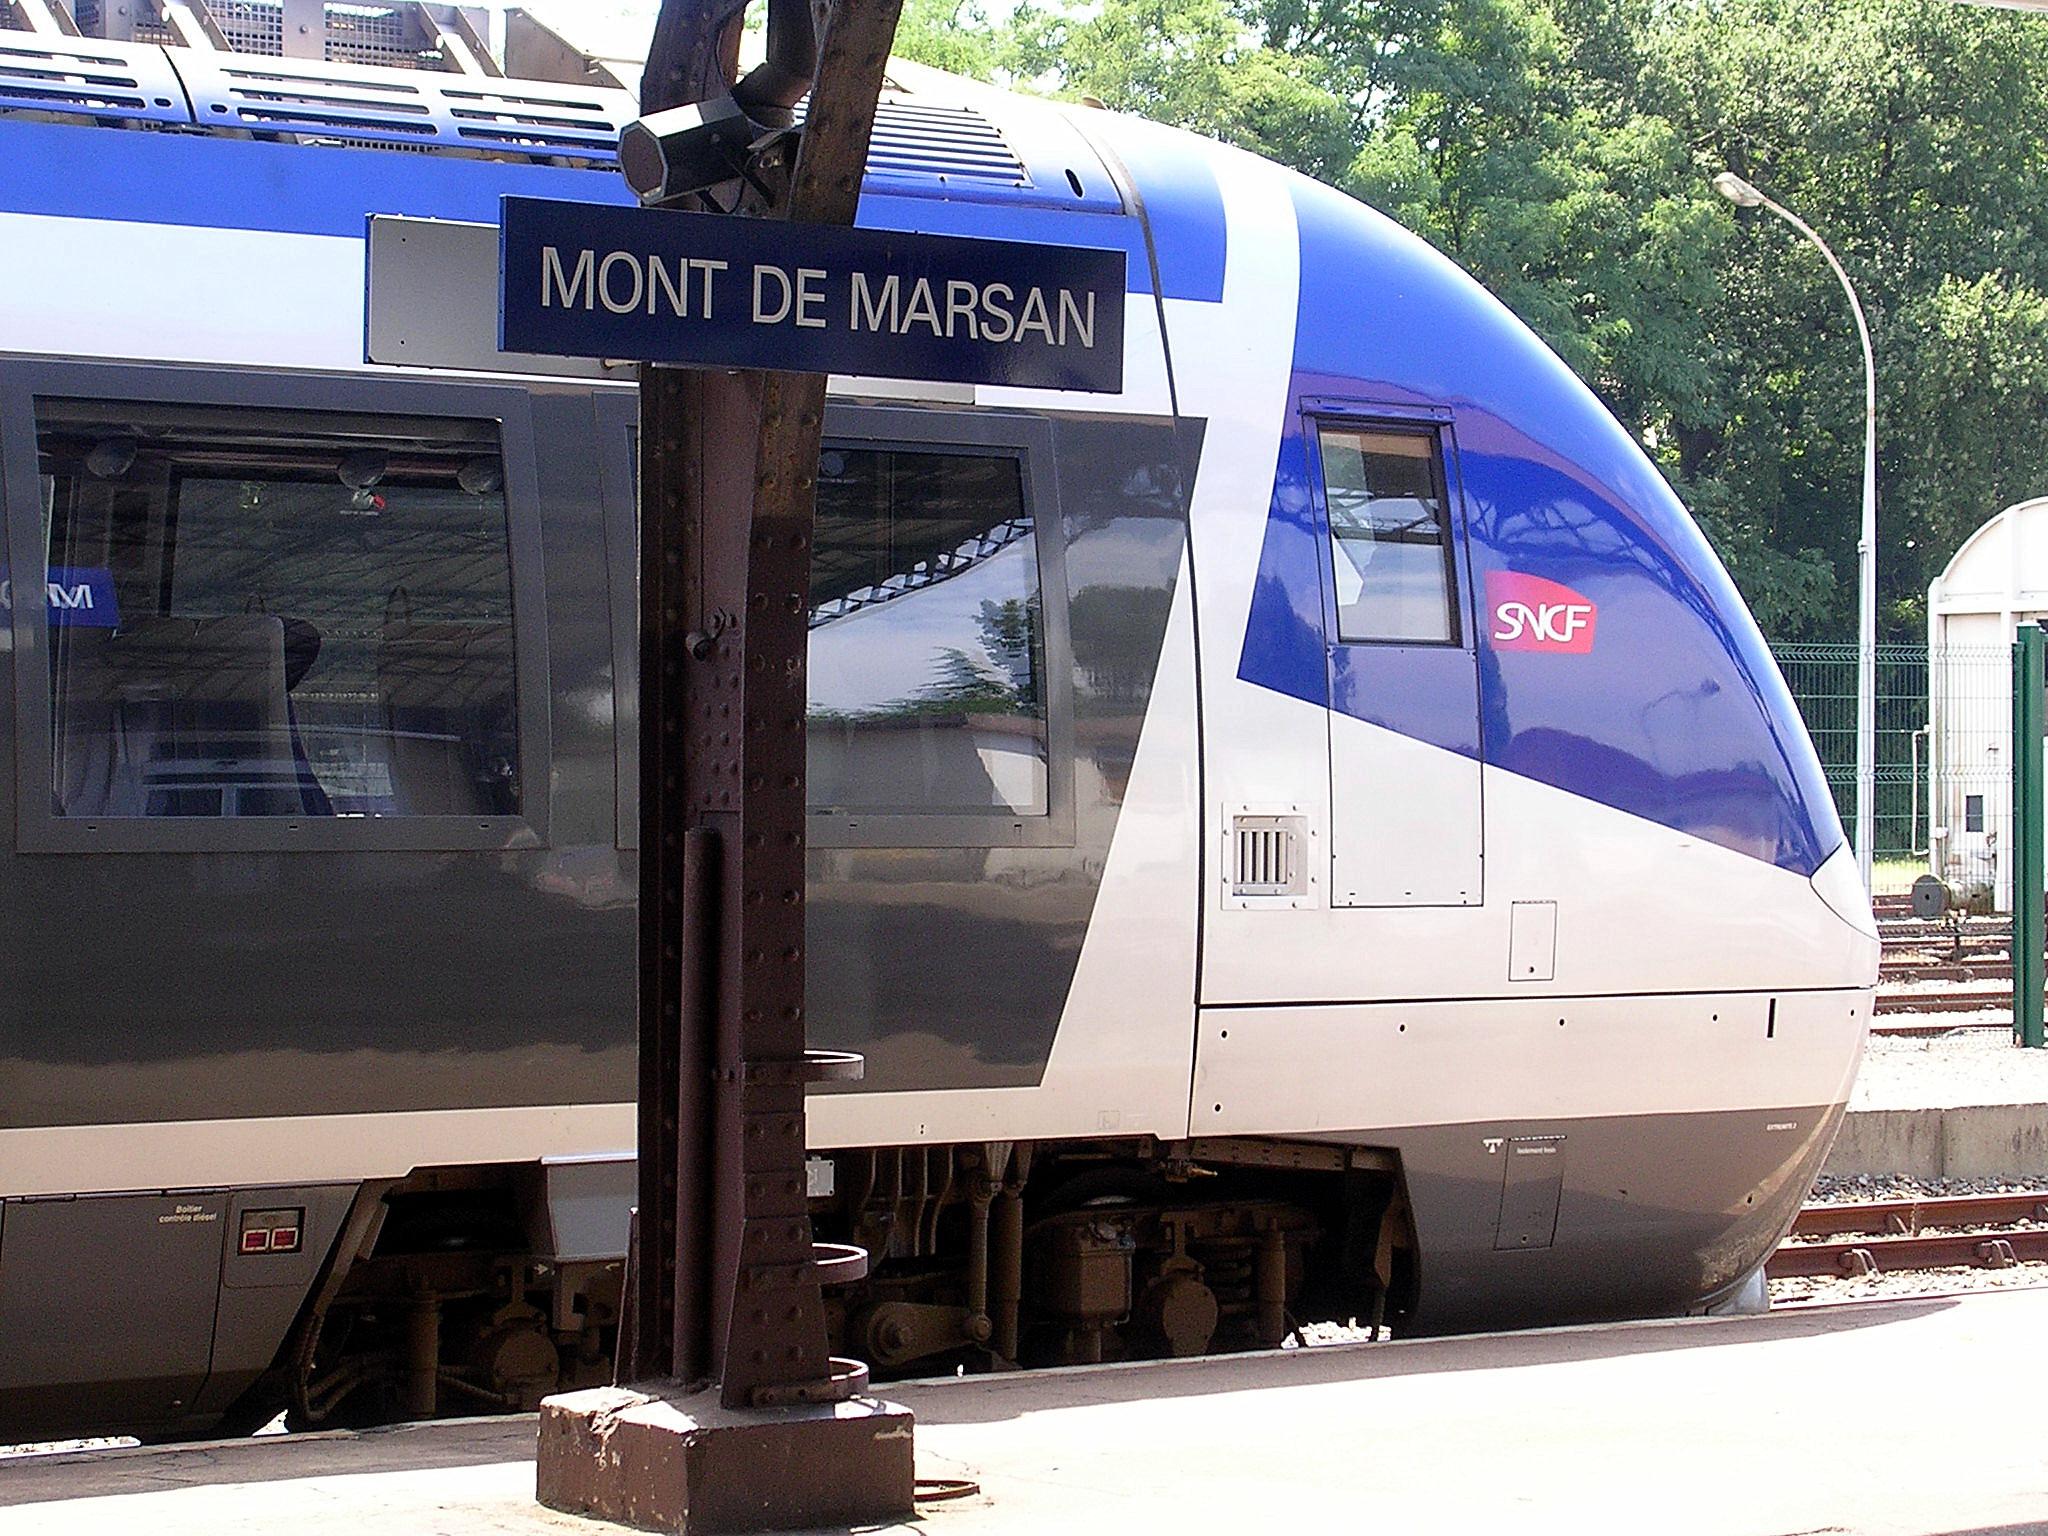 Station Mont-de-Marsan